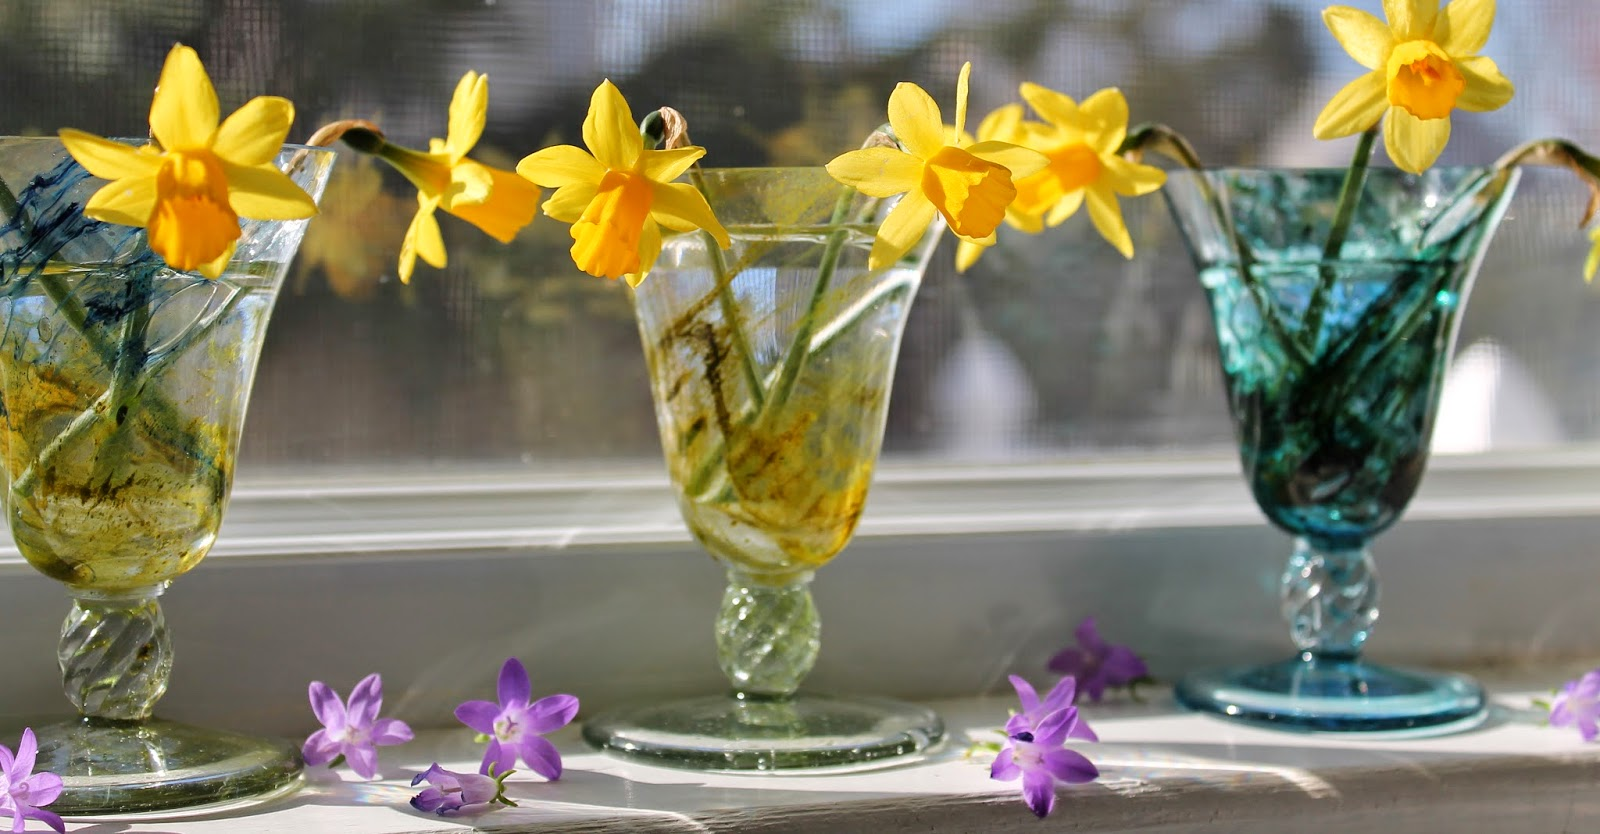 sweet-mini-daffodils-lovemysimplehome.com